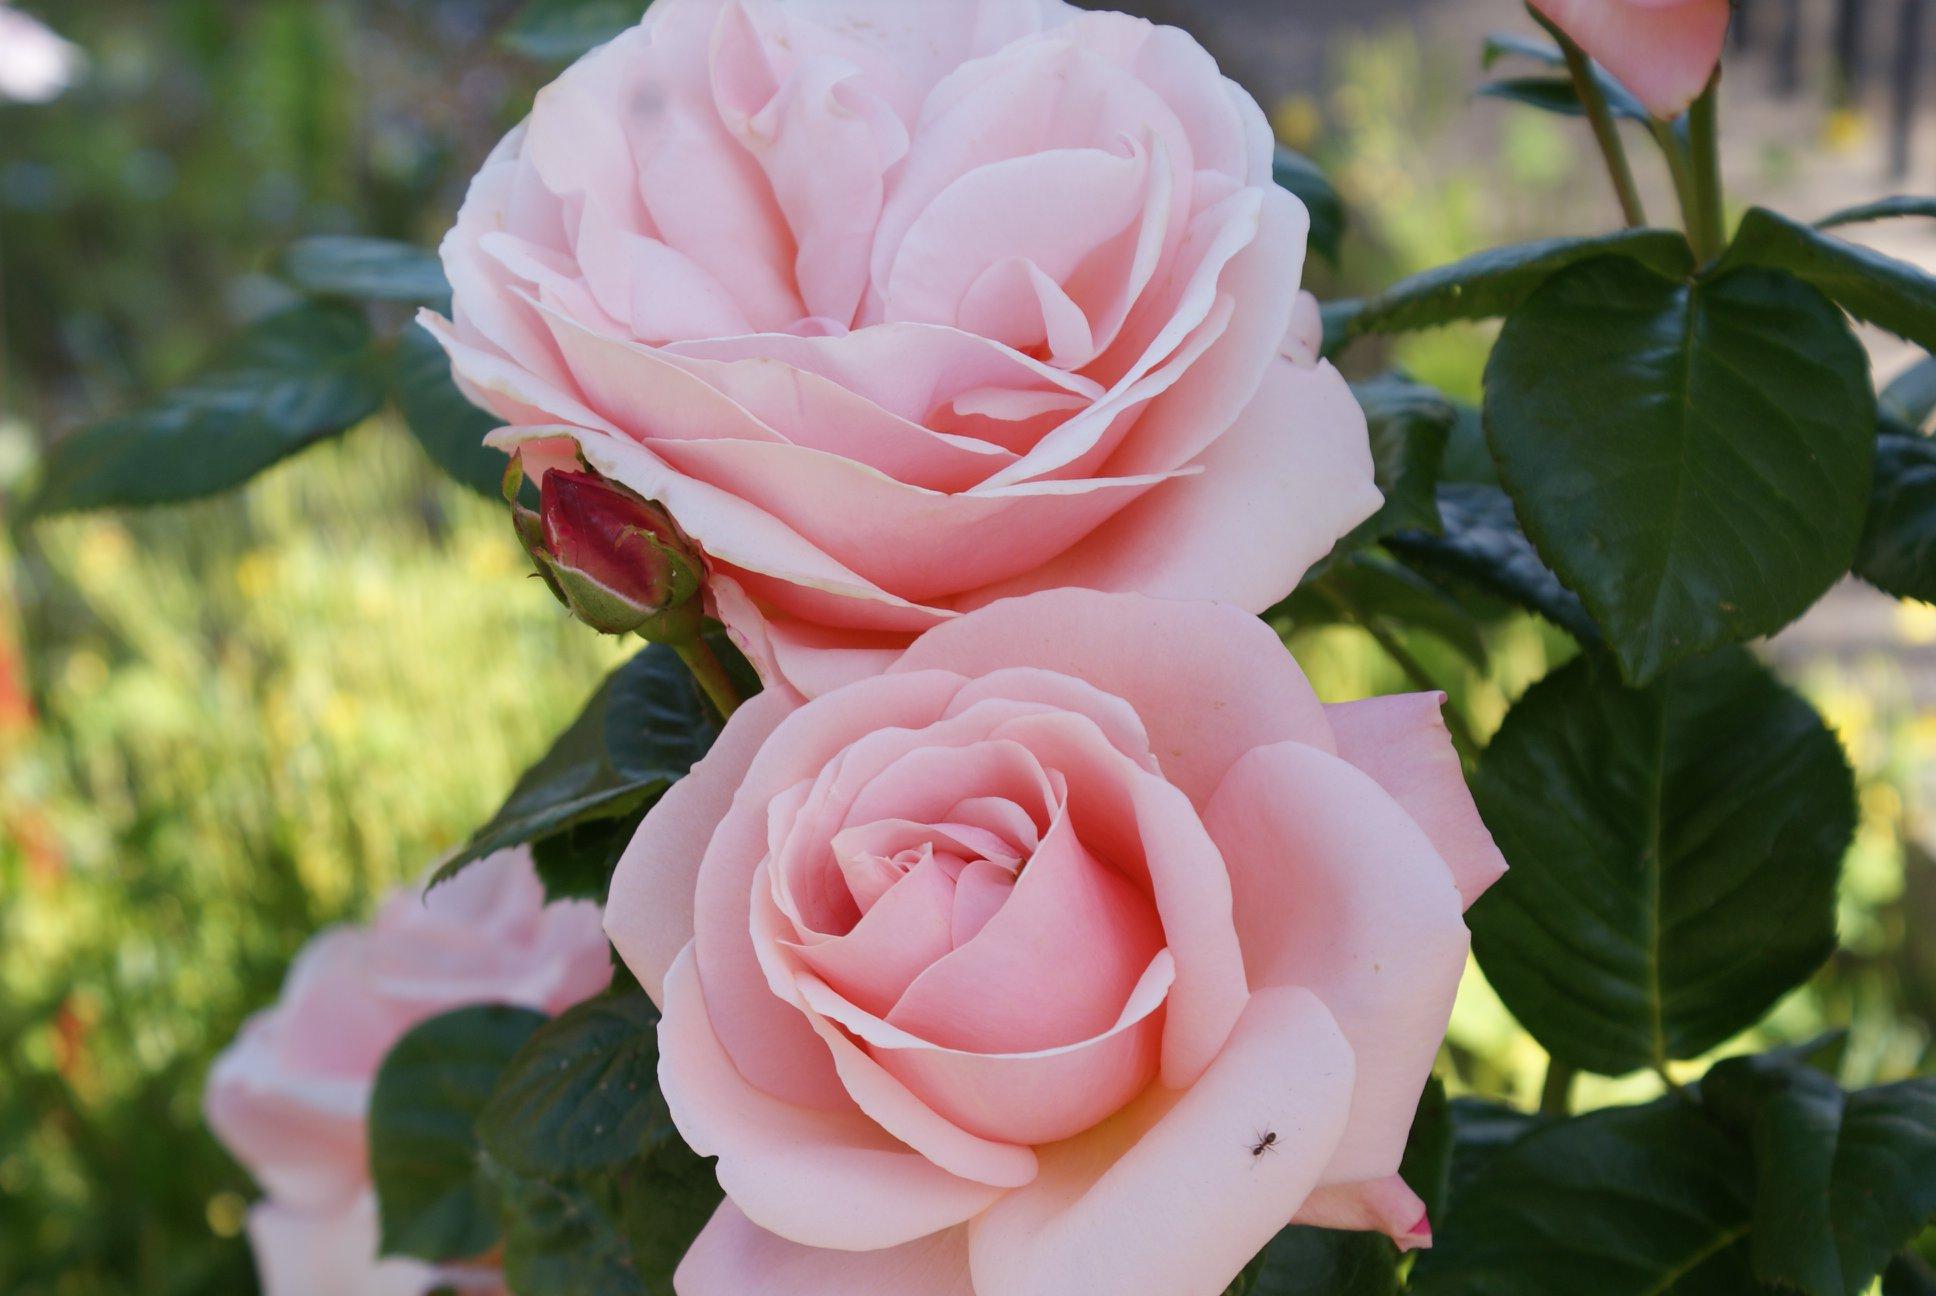 Goddess Hall Roses by Trevor Nuthall